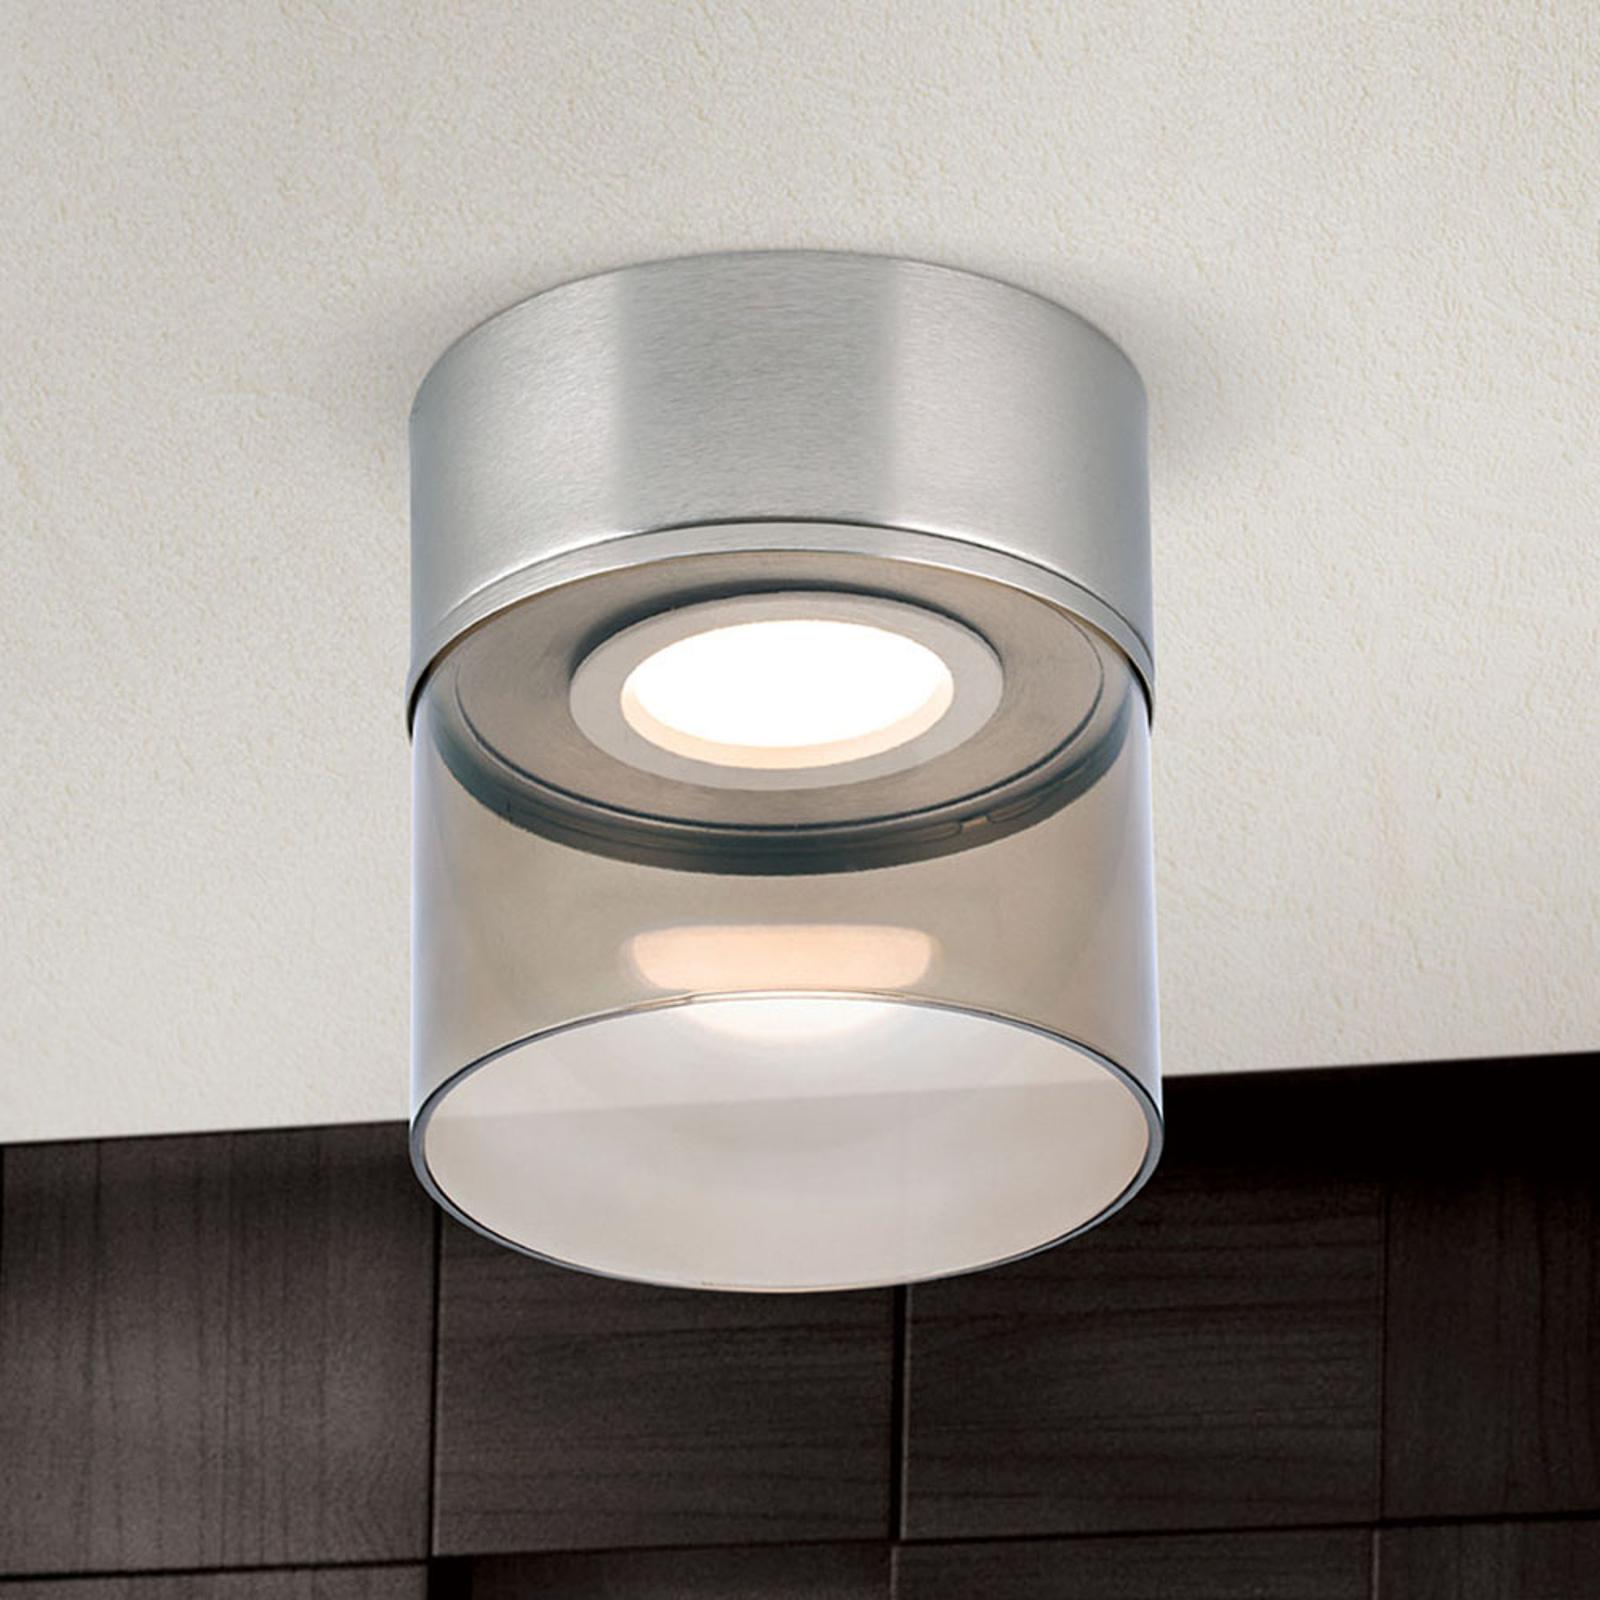 Plafonnier LED Francis nickel mat Ø 15cm